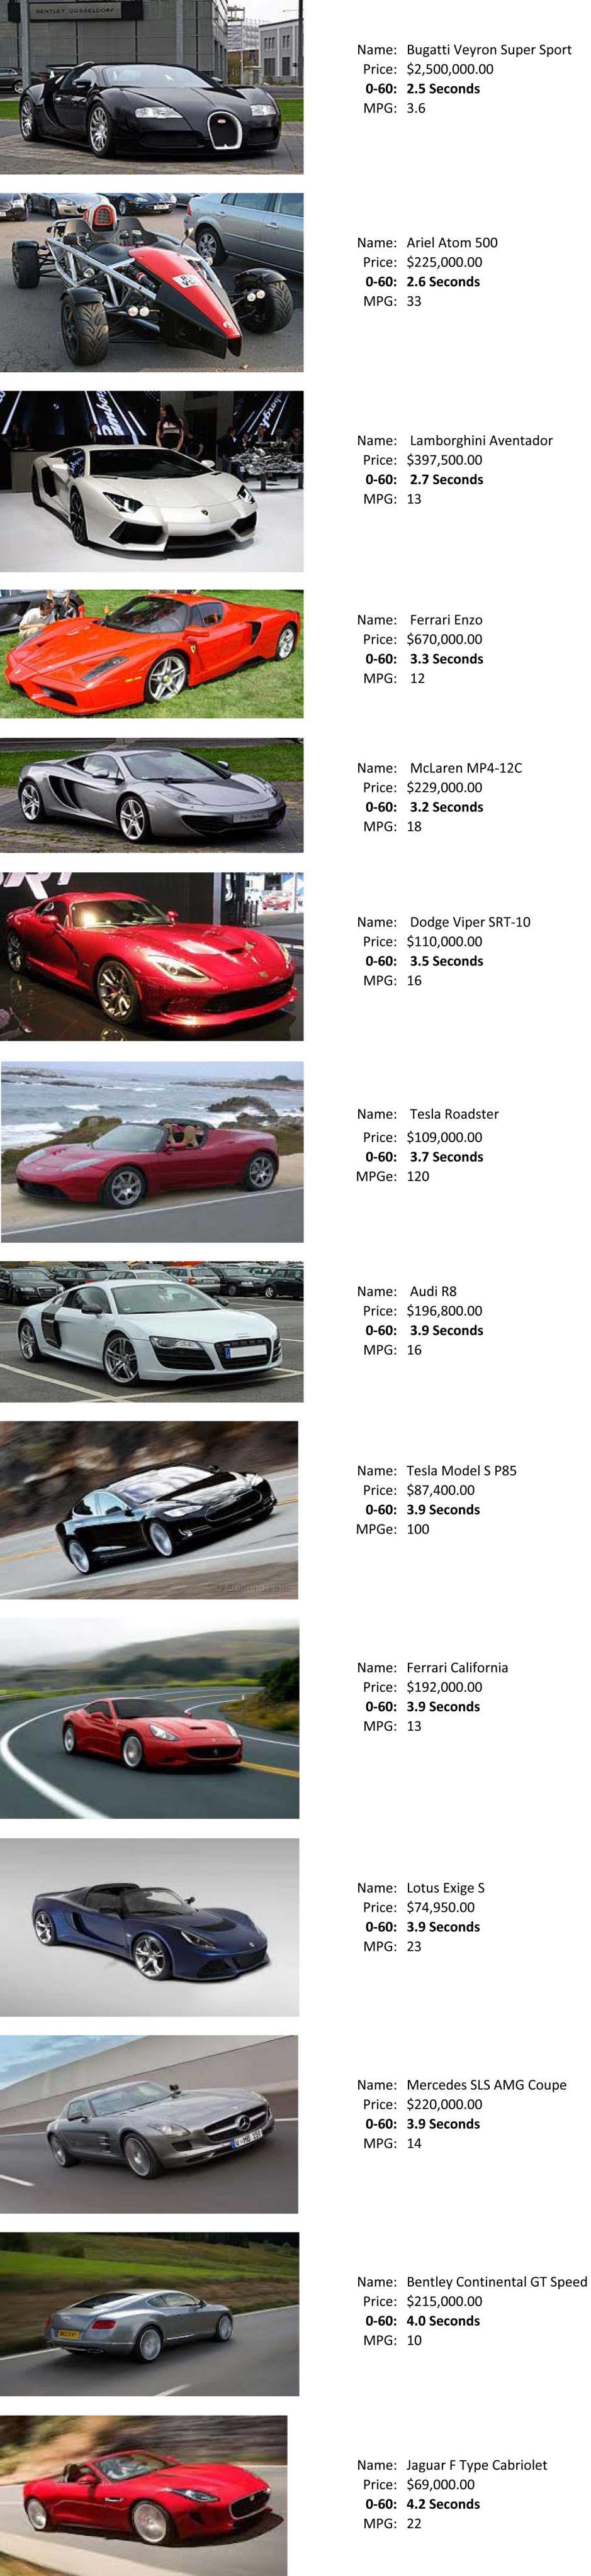 Model-S-as-fast-or-faster.jpg